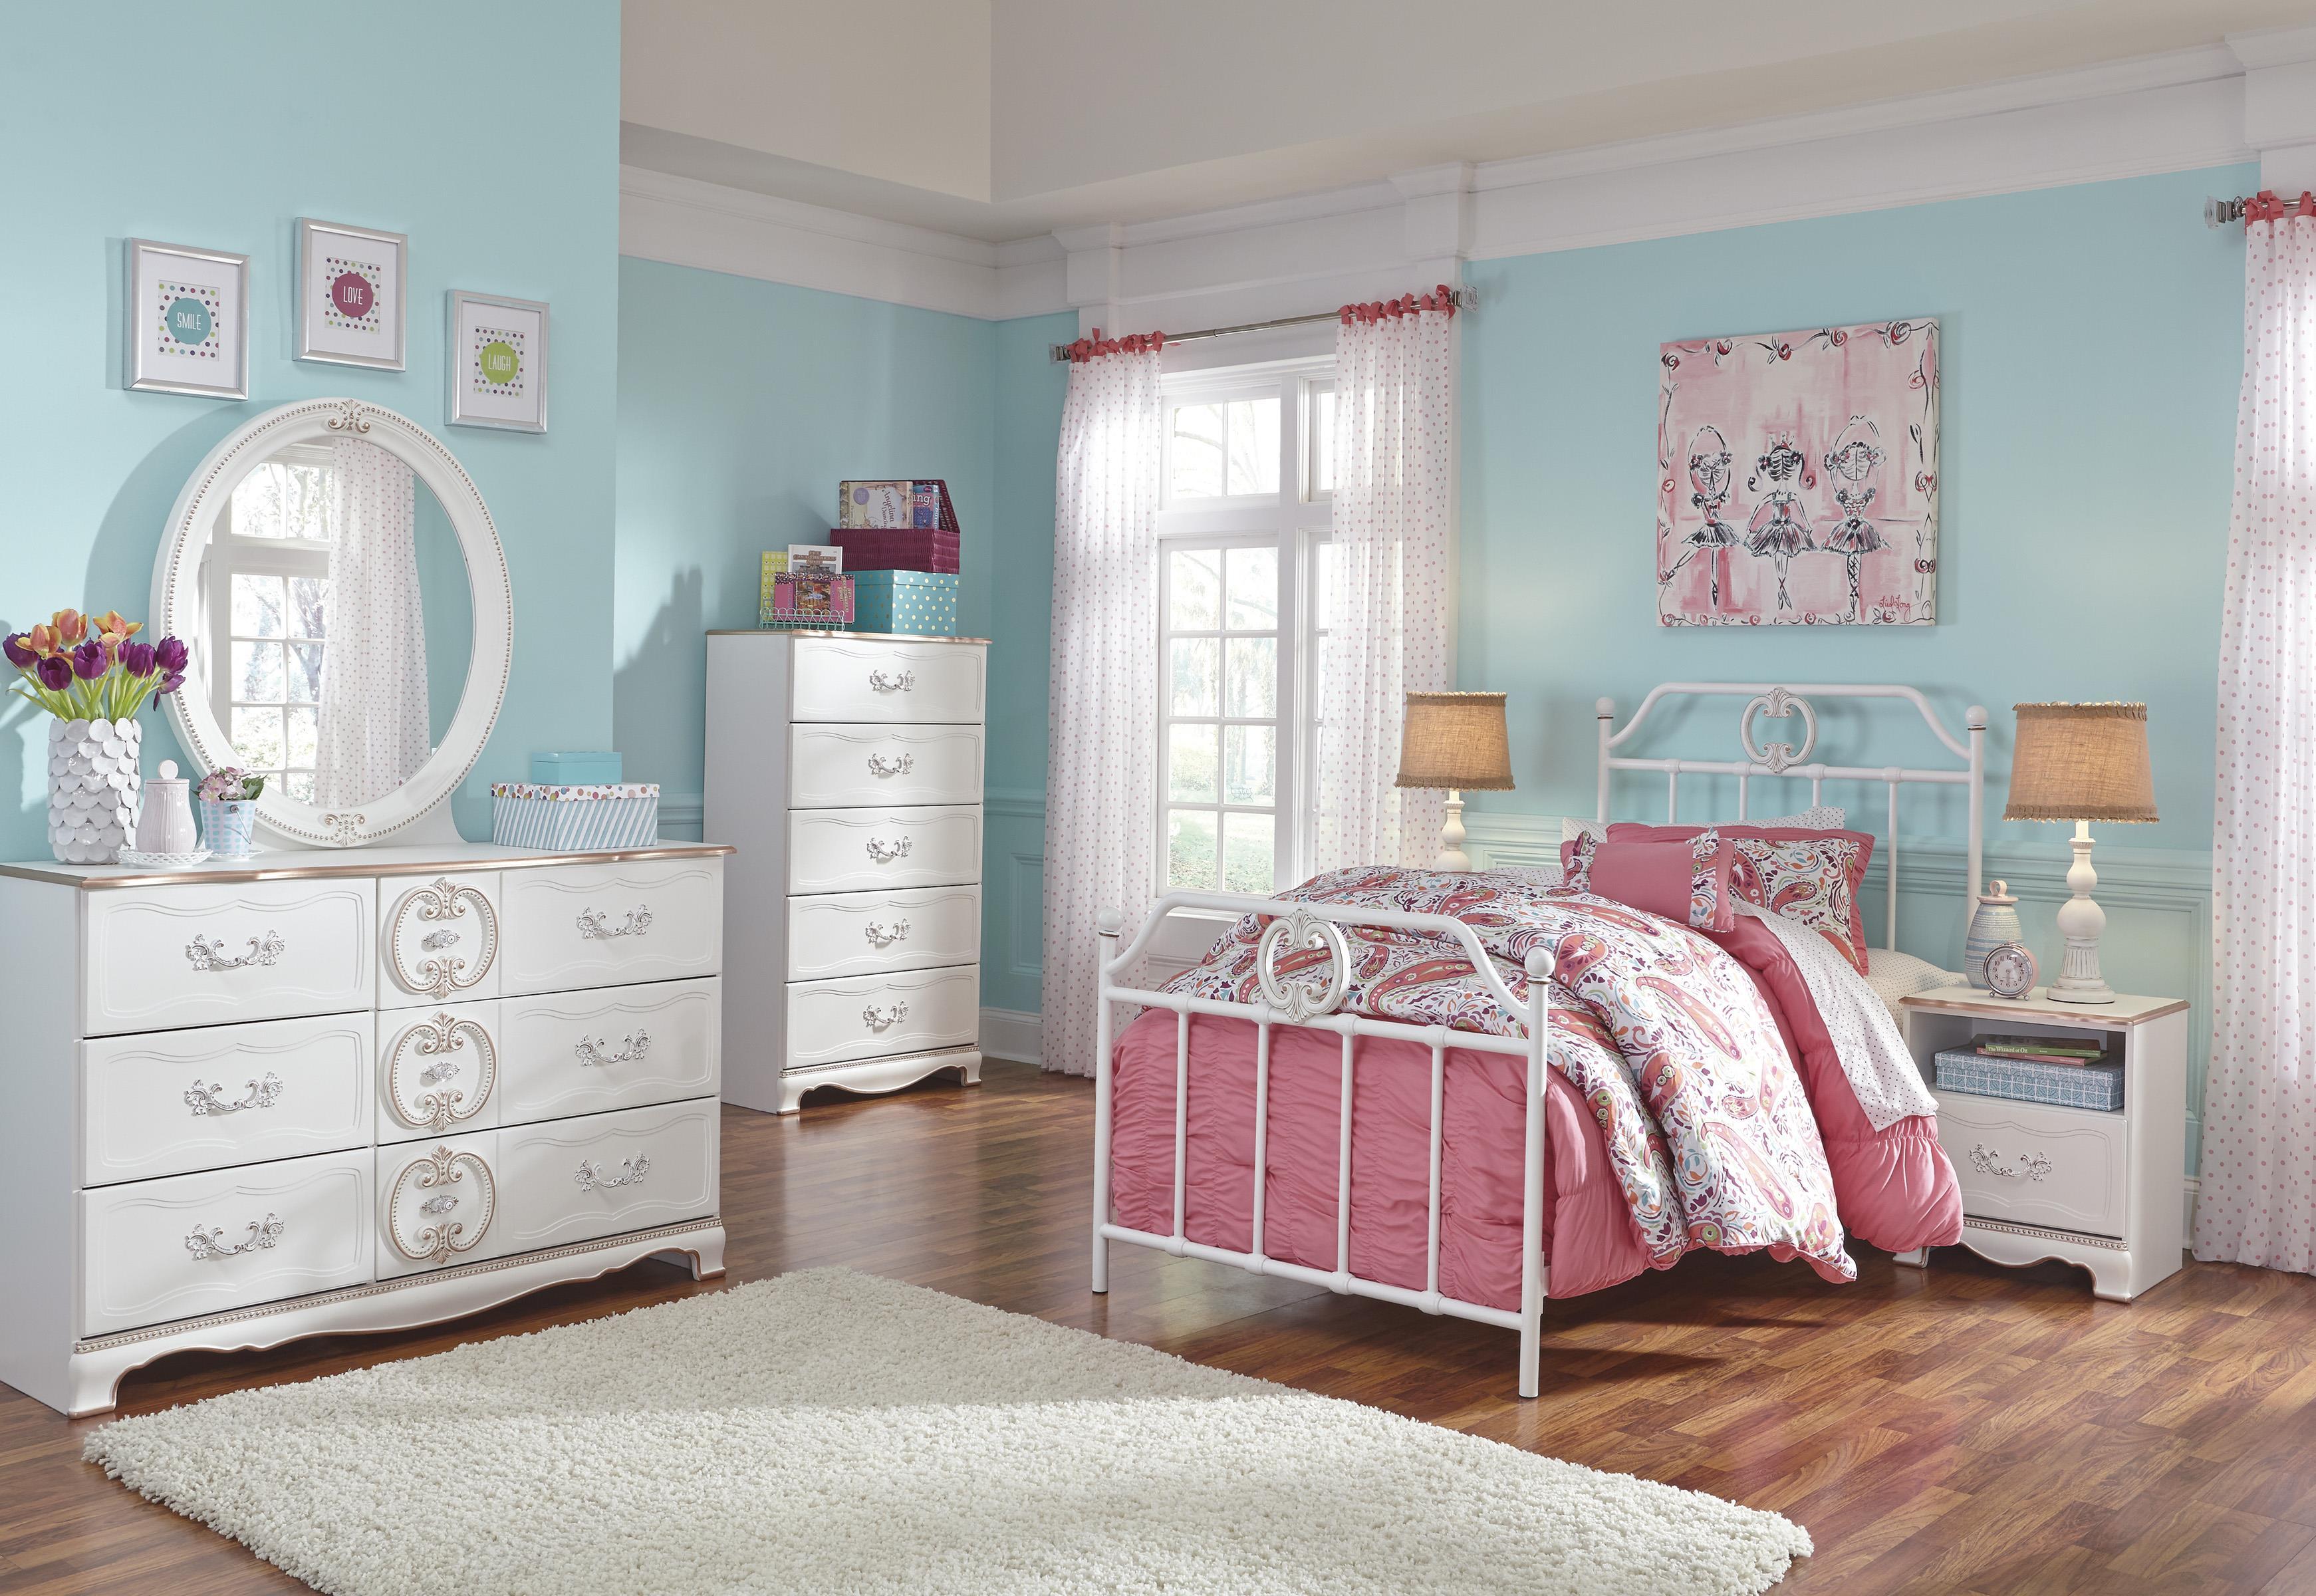 Signature Design by Ashley Korabella Full Bedroom Group - Item Number: B355 F Bedroom Group 3